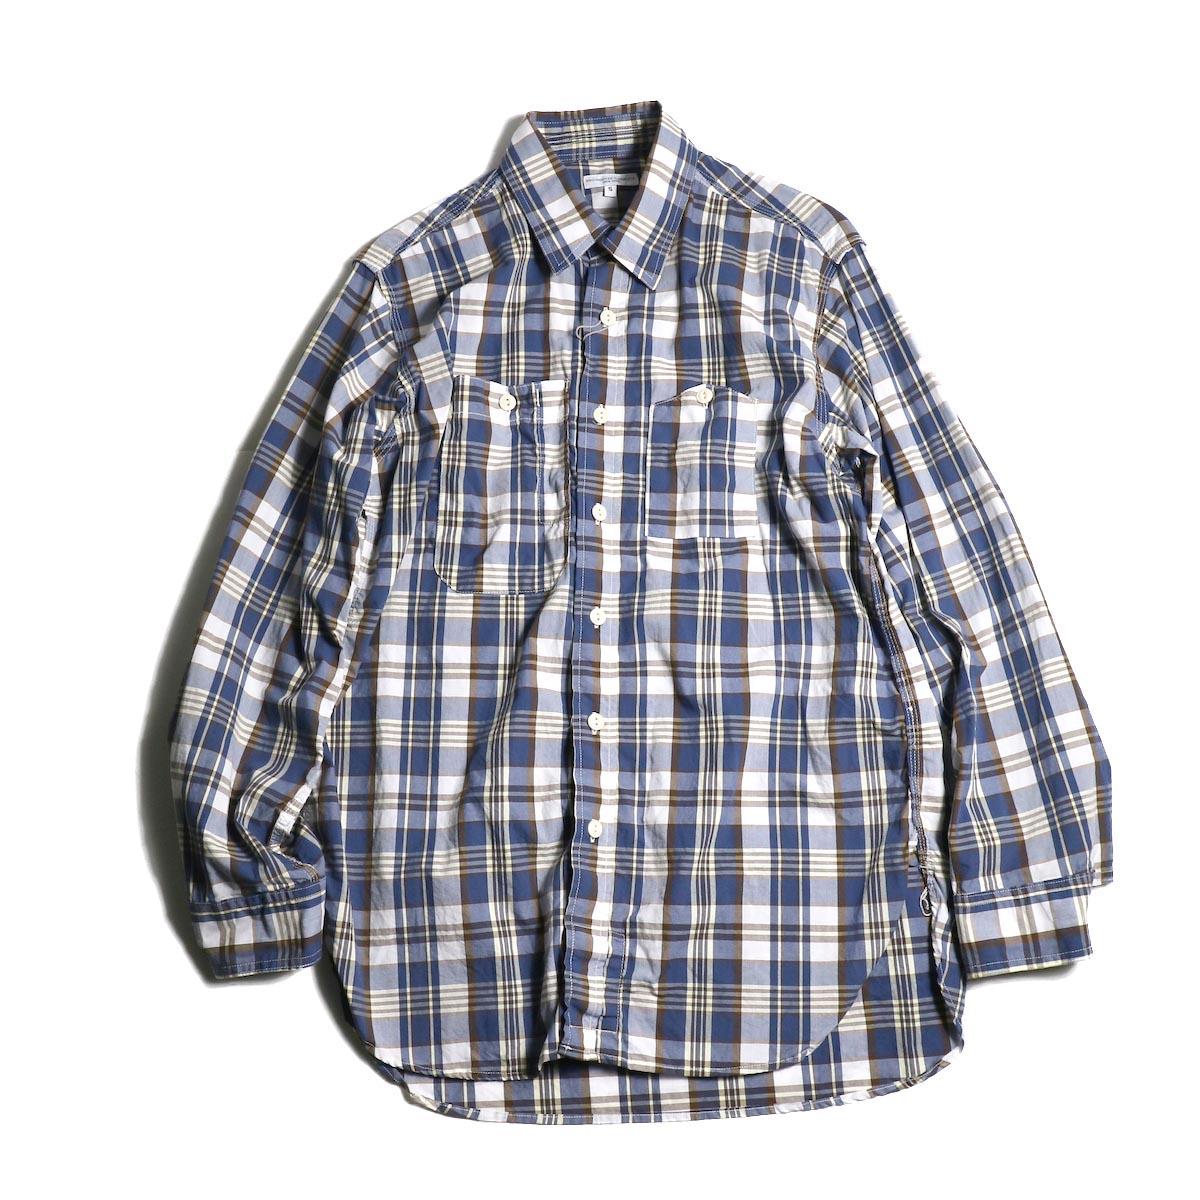 Engineered Garments / Work Shirt -Plaid Broadcloth (Navy/ Brown)